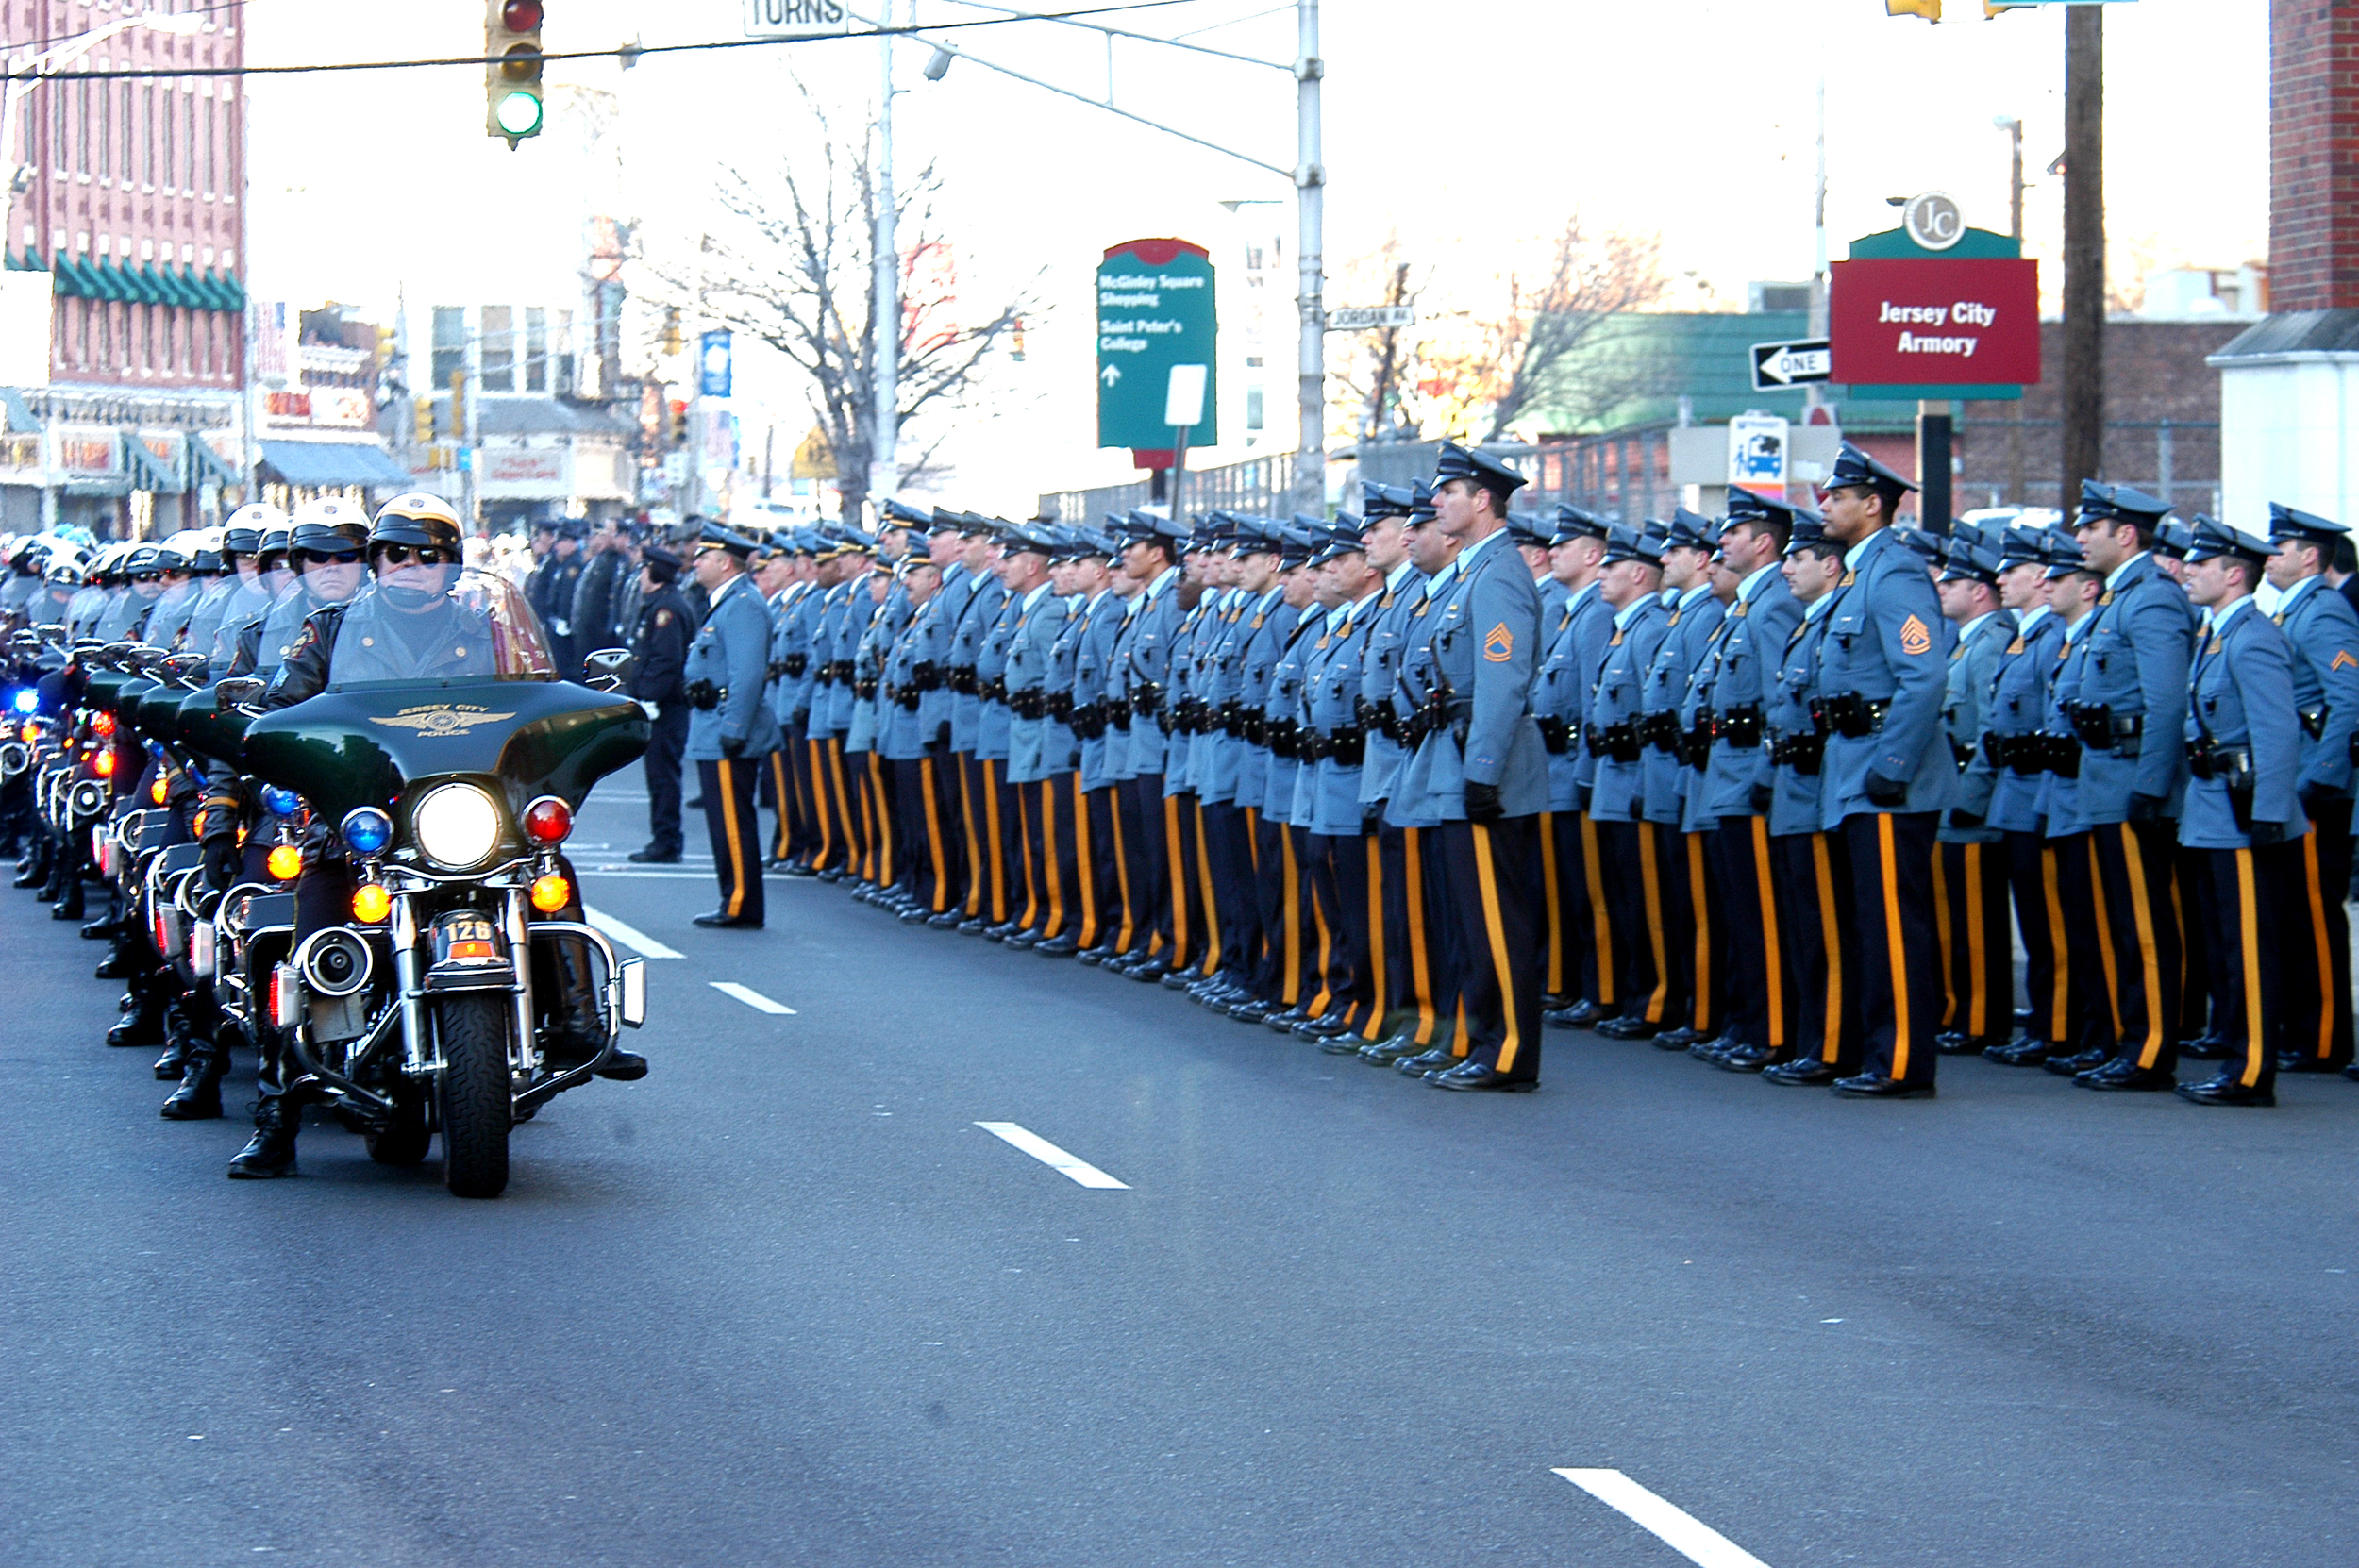 Police escort for deceased Jersey City Police Officer  Jan. 07, 2006.jpg